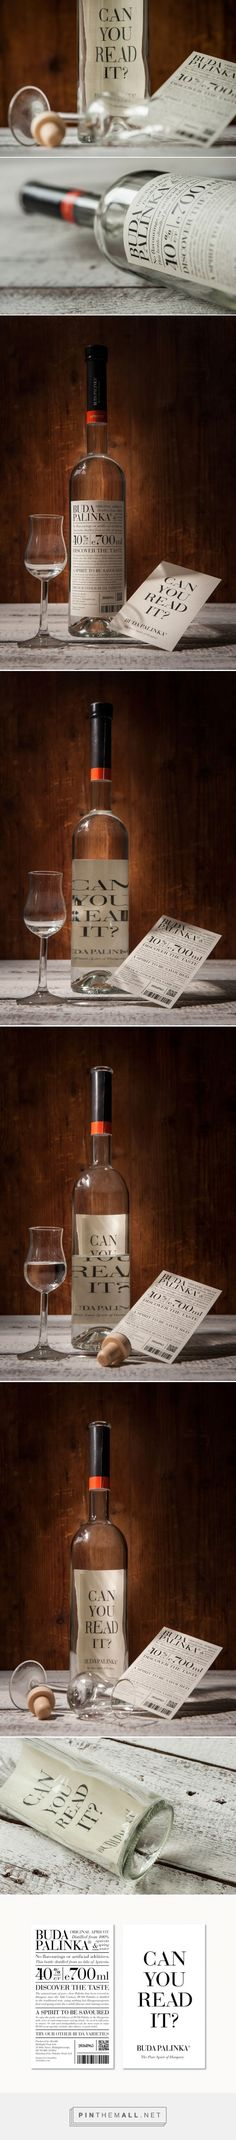 Buda Pálinka #concept #packaging by kissmiklos - http://www.packagingoftheworld.com/2015/02/buda-palinka-concept.html